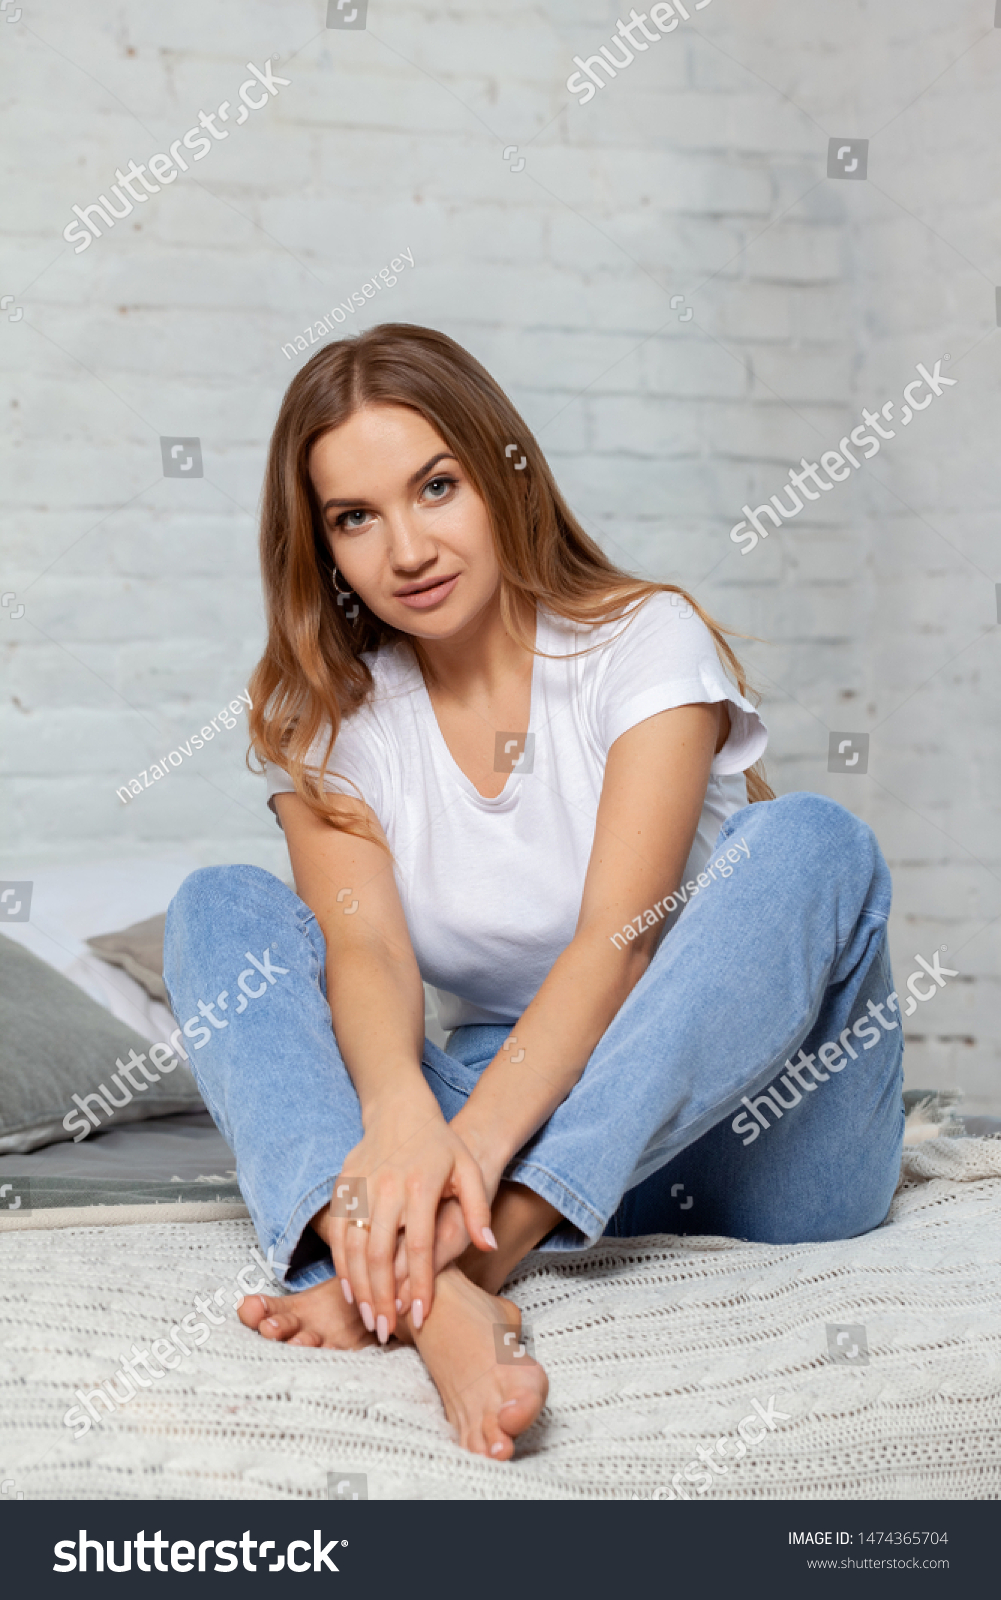 Indoor Portrait Beautiful Blonde Woman Posing Stock Photo Edit Now 1474365704